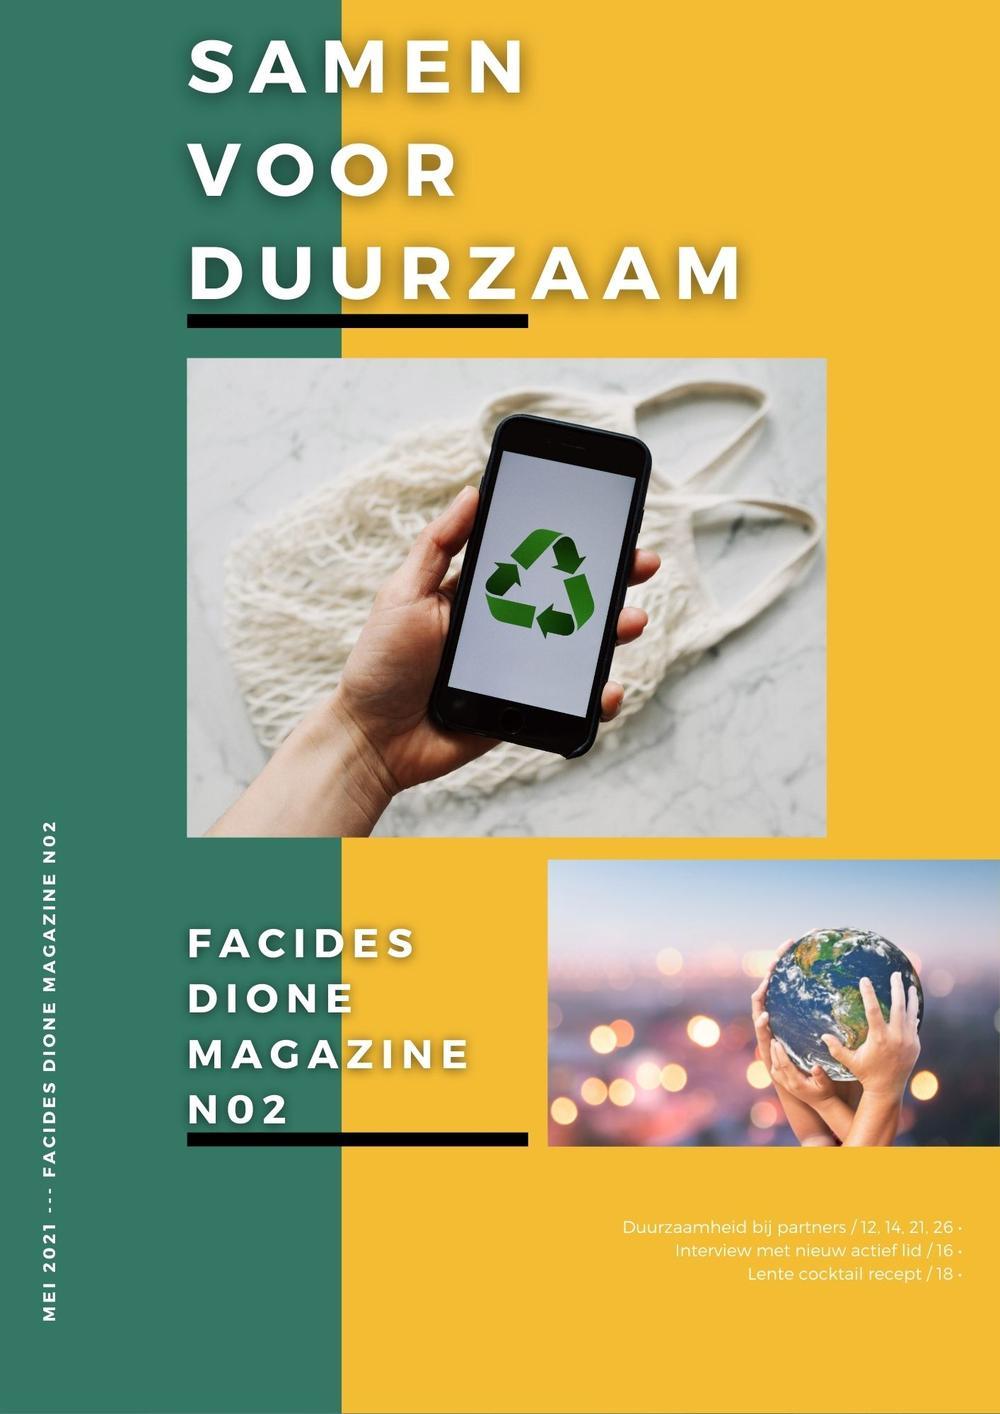 Magazine #2 NL